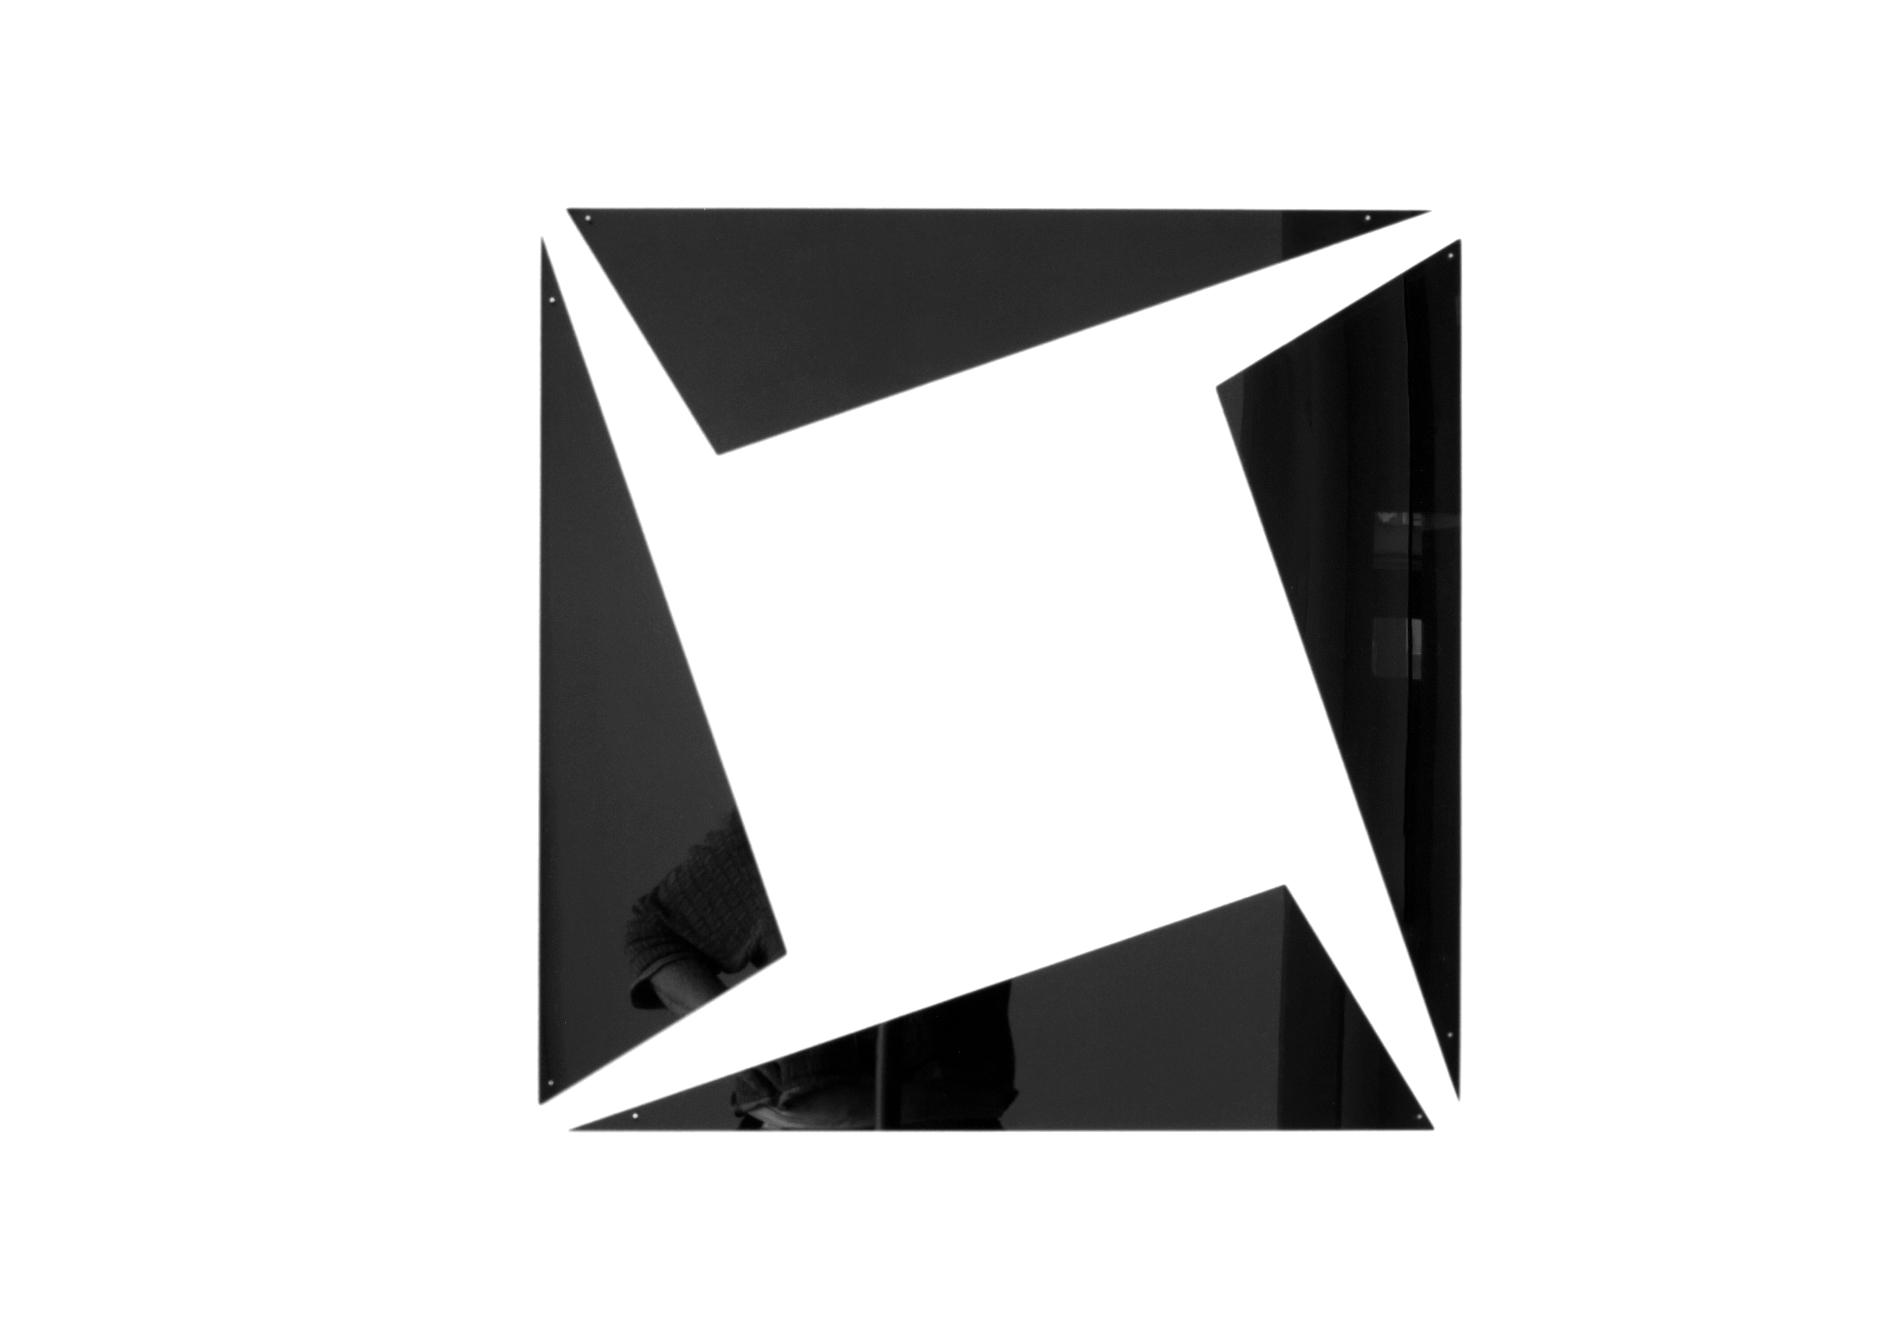 insideout square #2_2021_black perspex_61 x 61 x 0,3 cm, edition 3 + e.a.